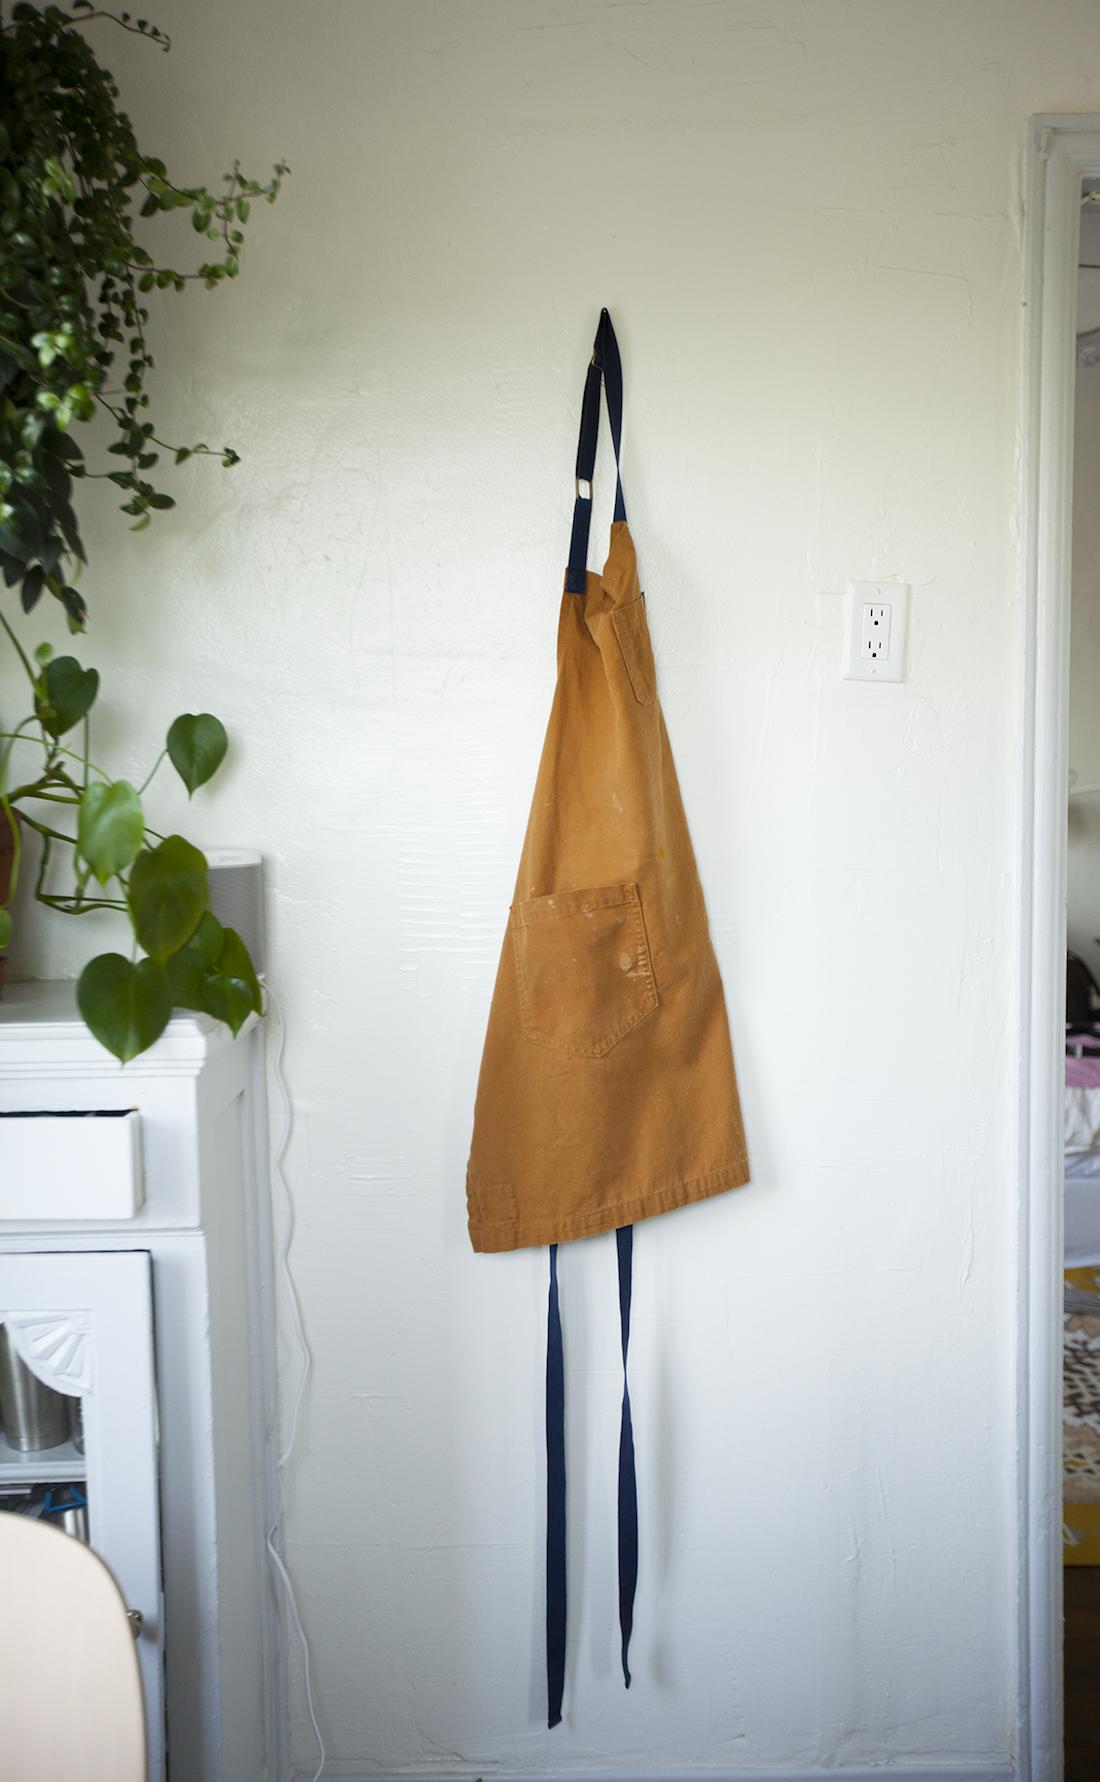 Lee's apron hangs in her kitchen